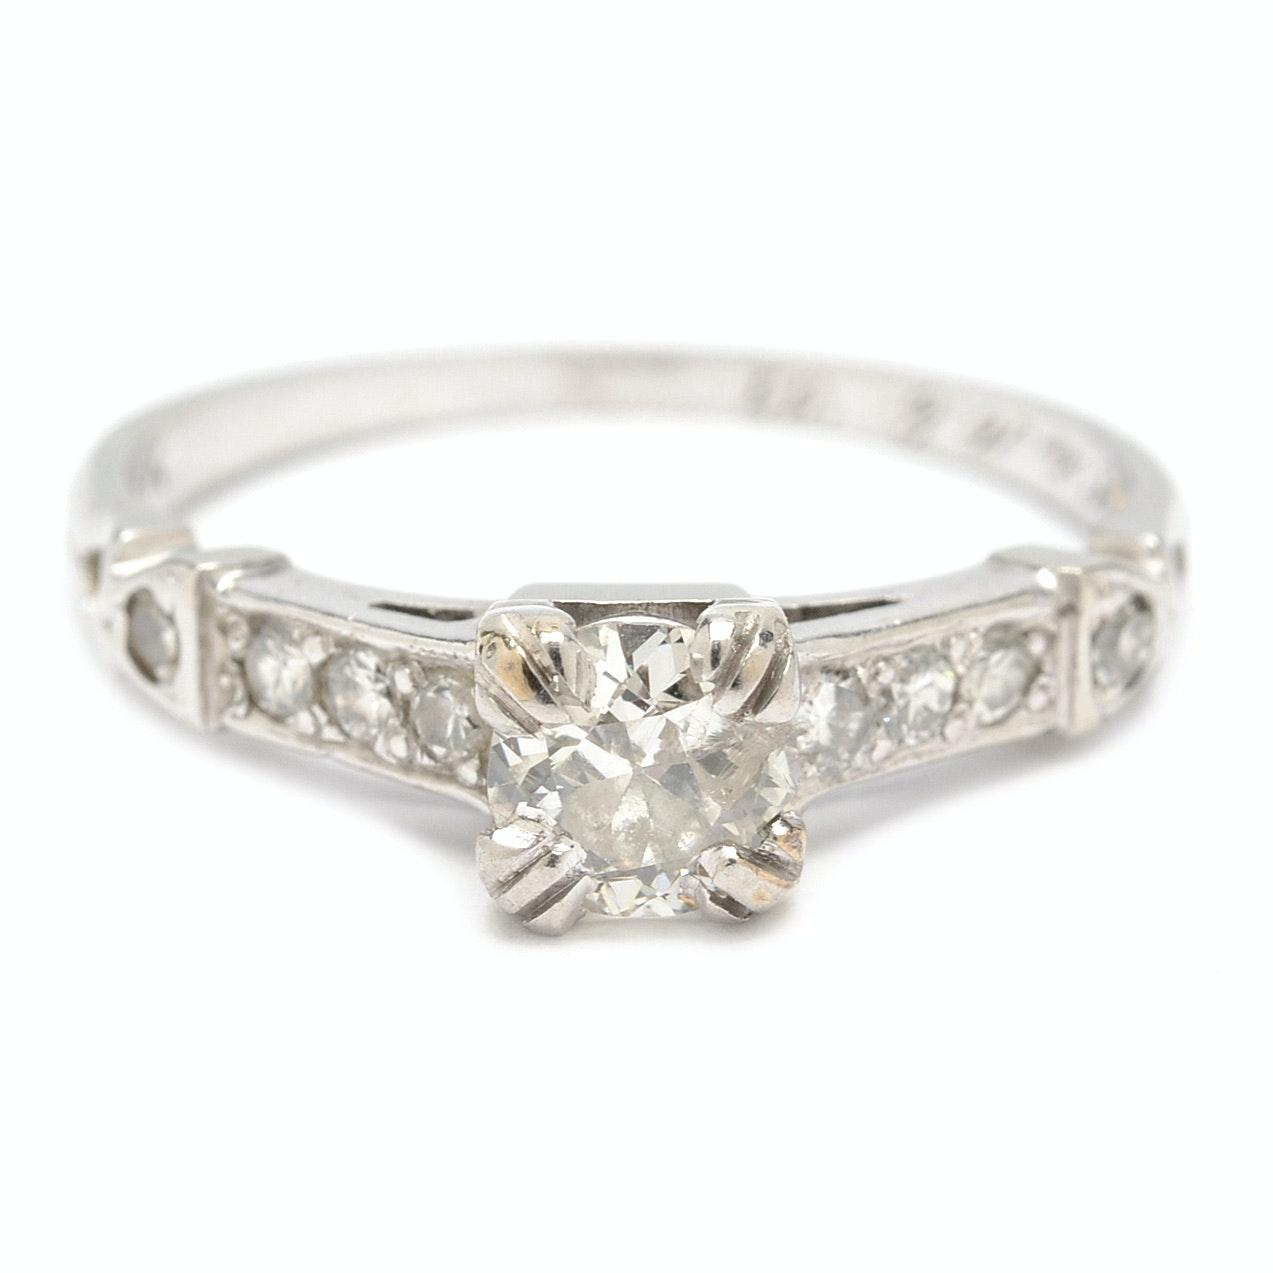 18K White Gold Art Deco Transitional Cut Diamond Ring